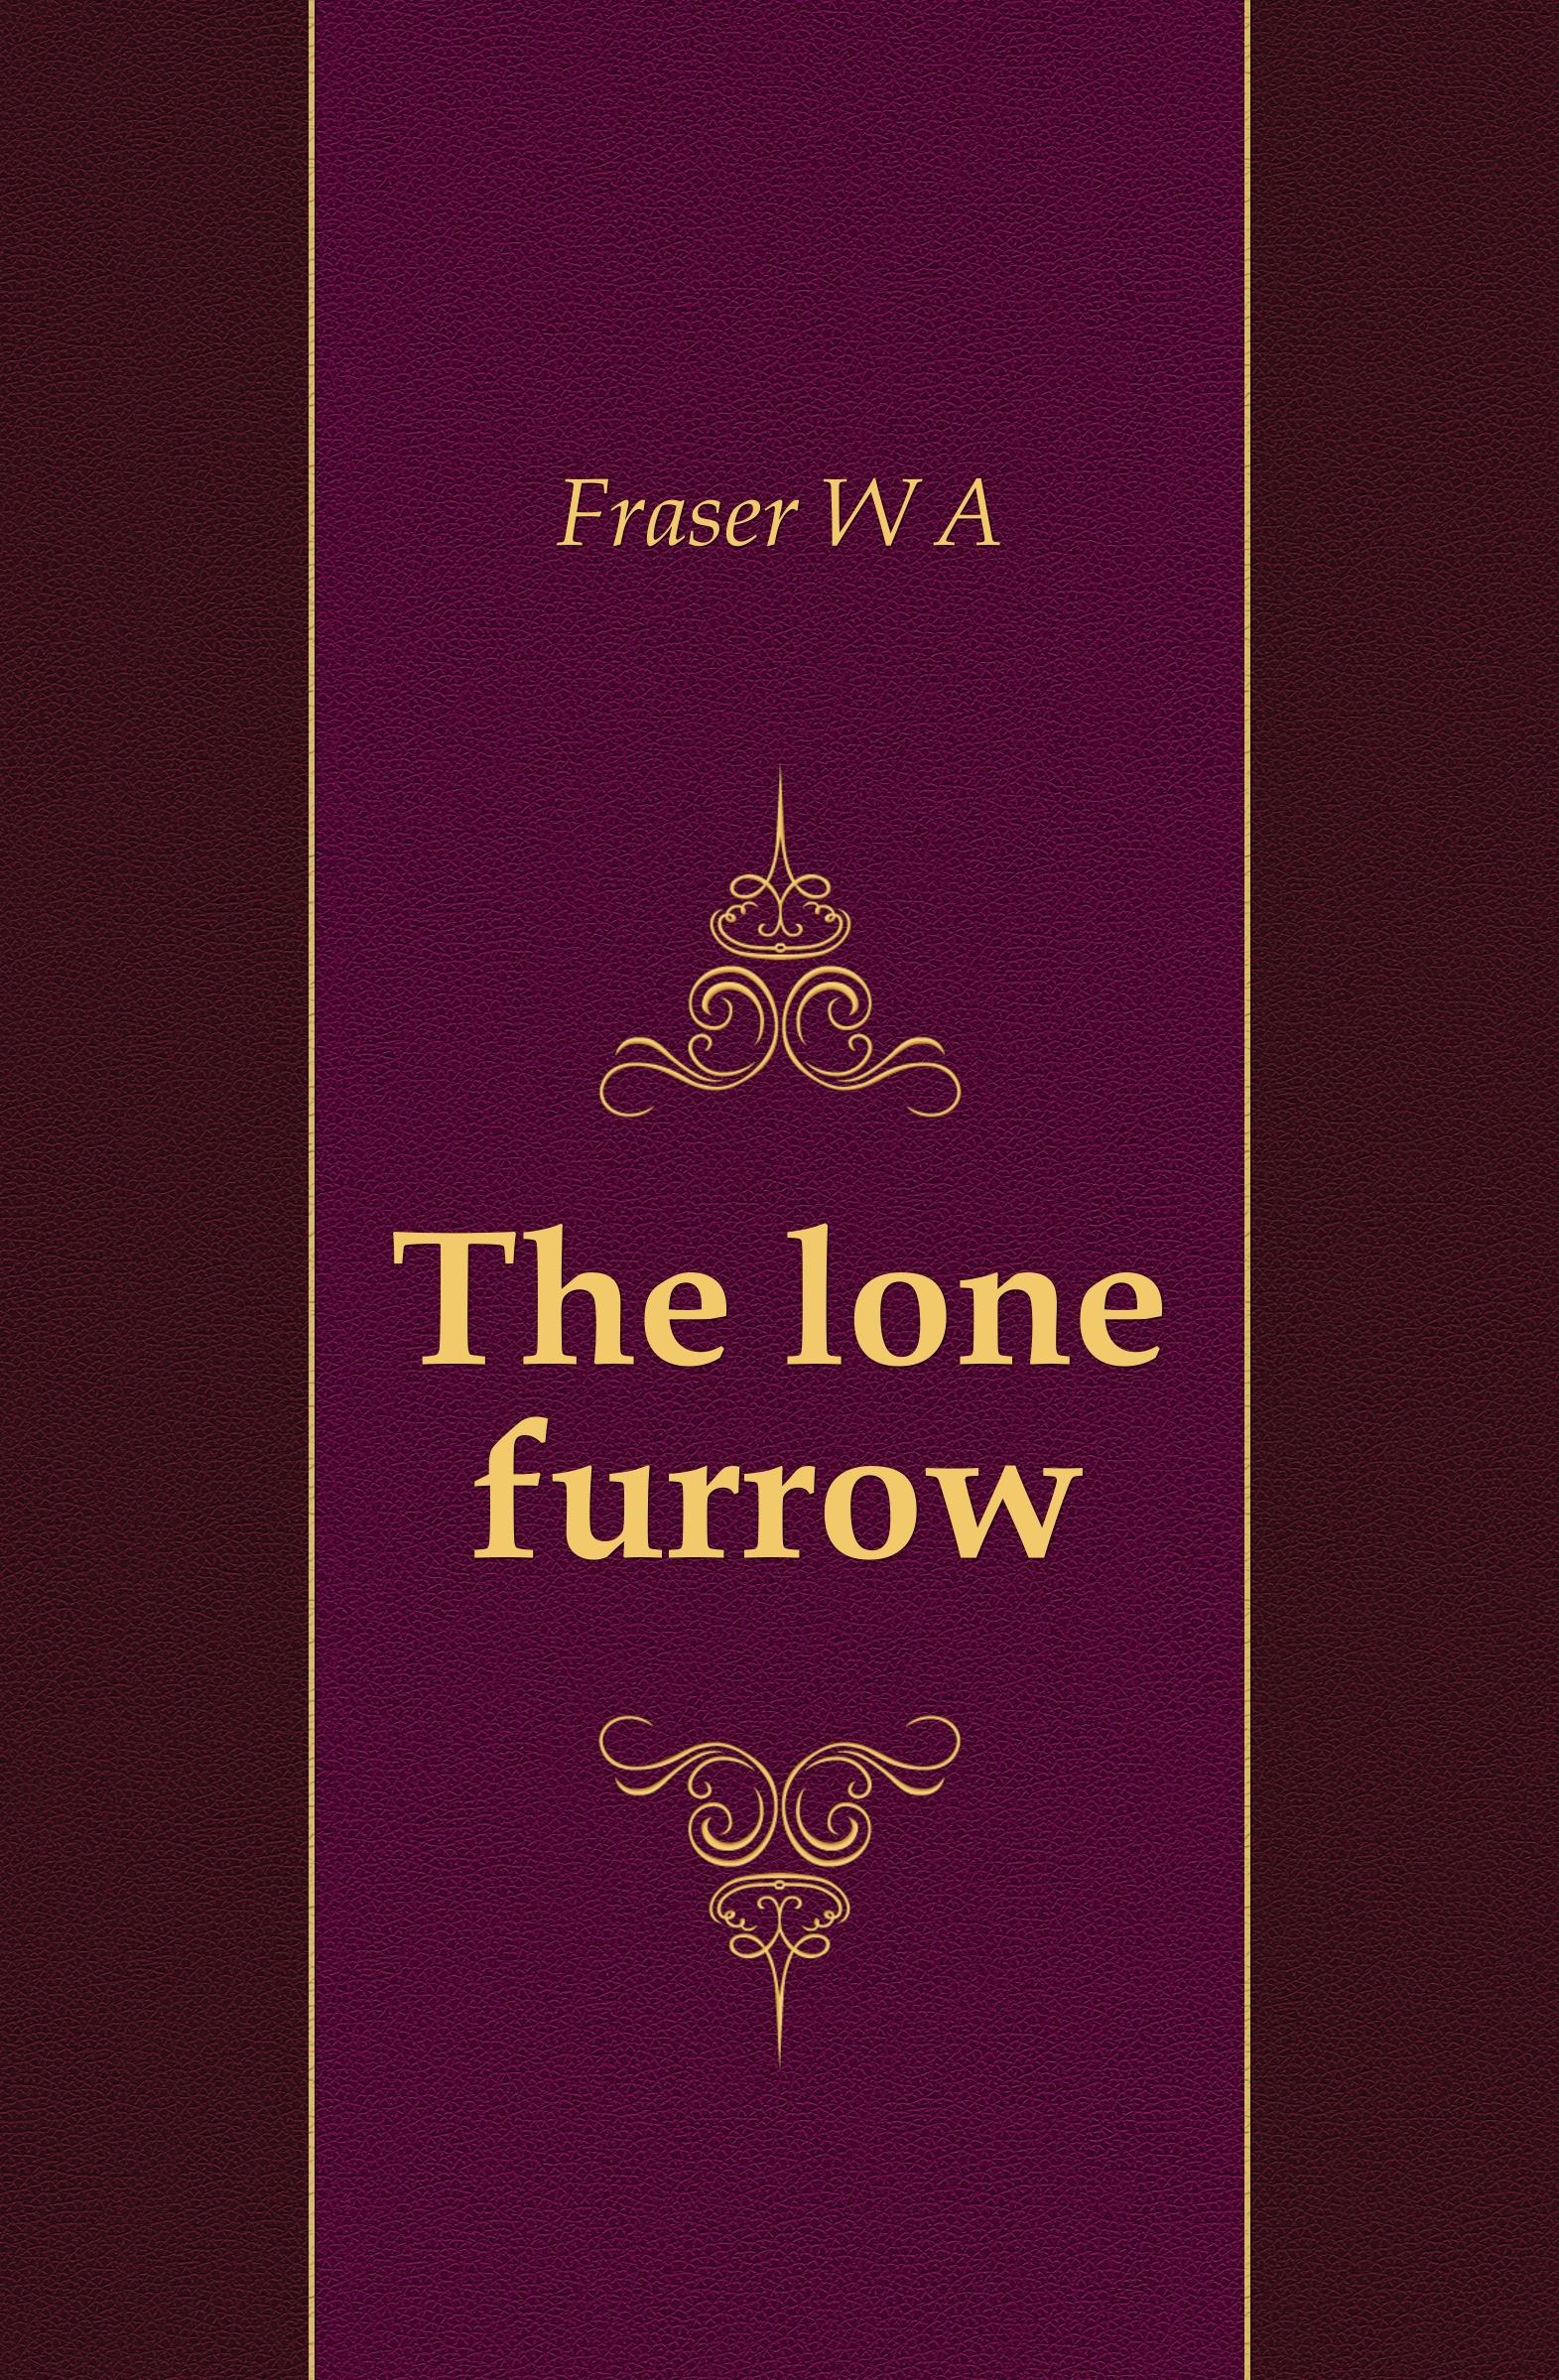 W. A. Fraser The lone furrow plough the furrow